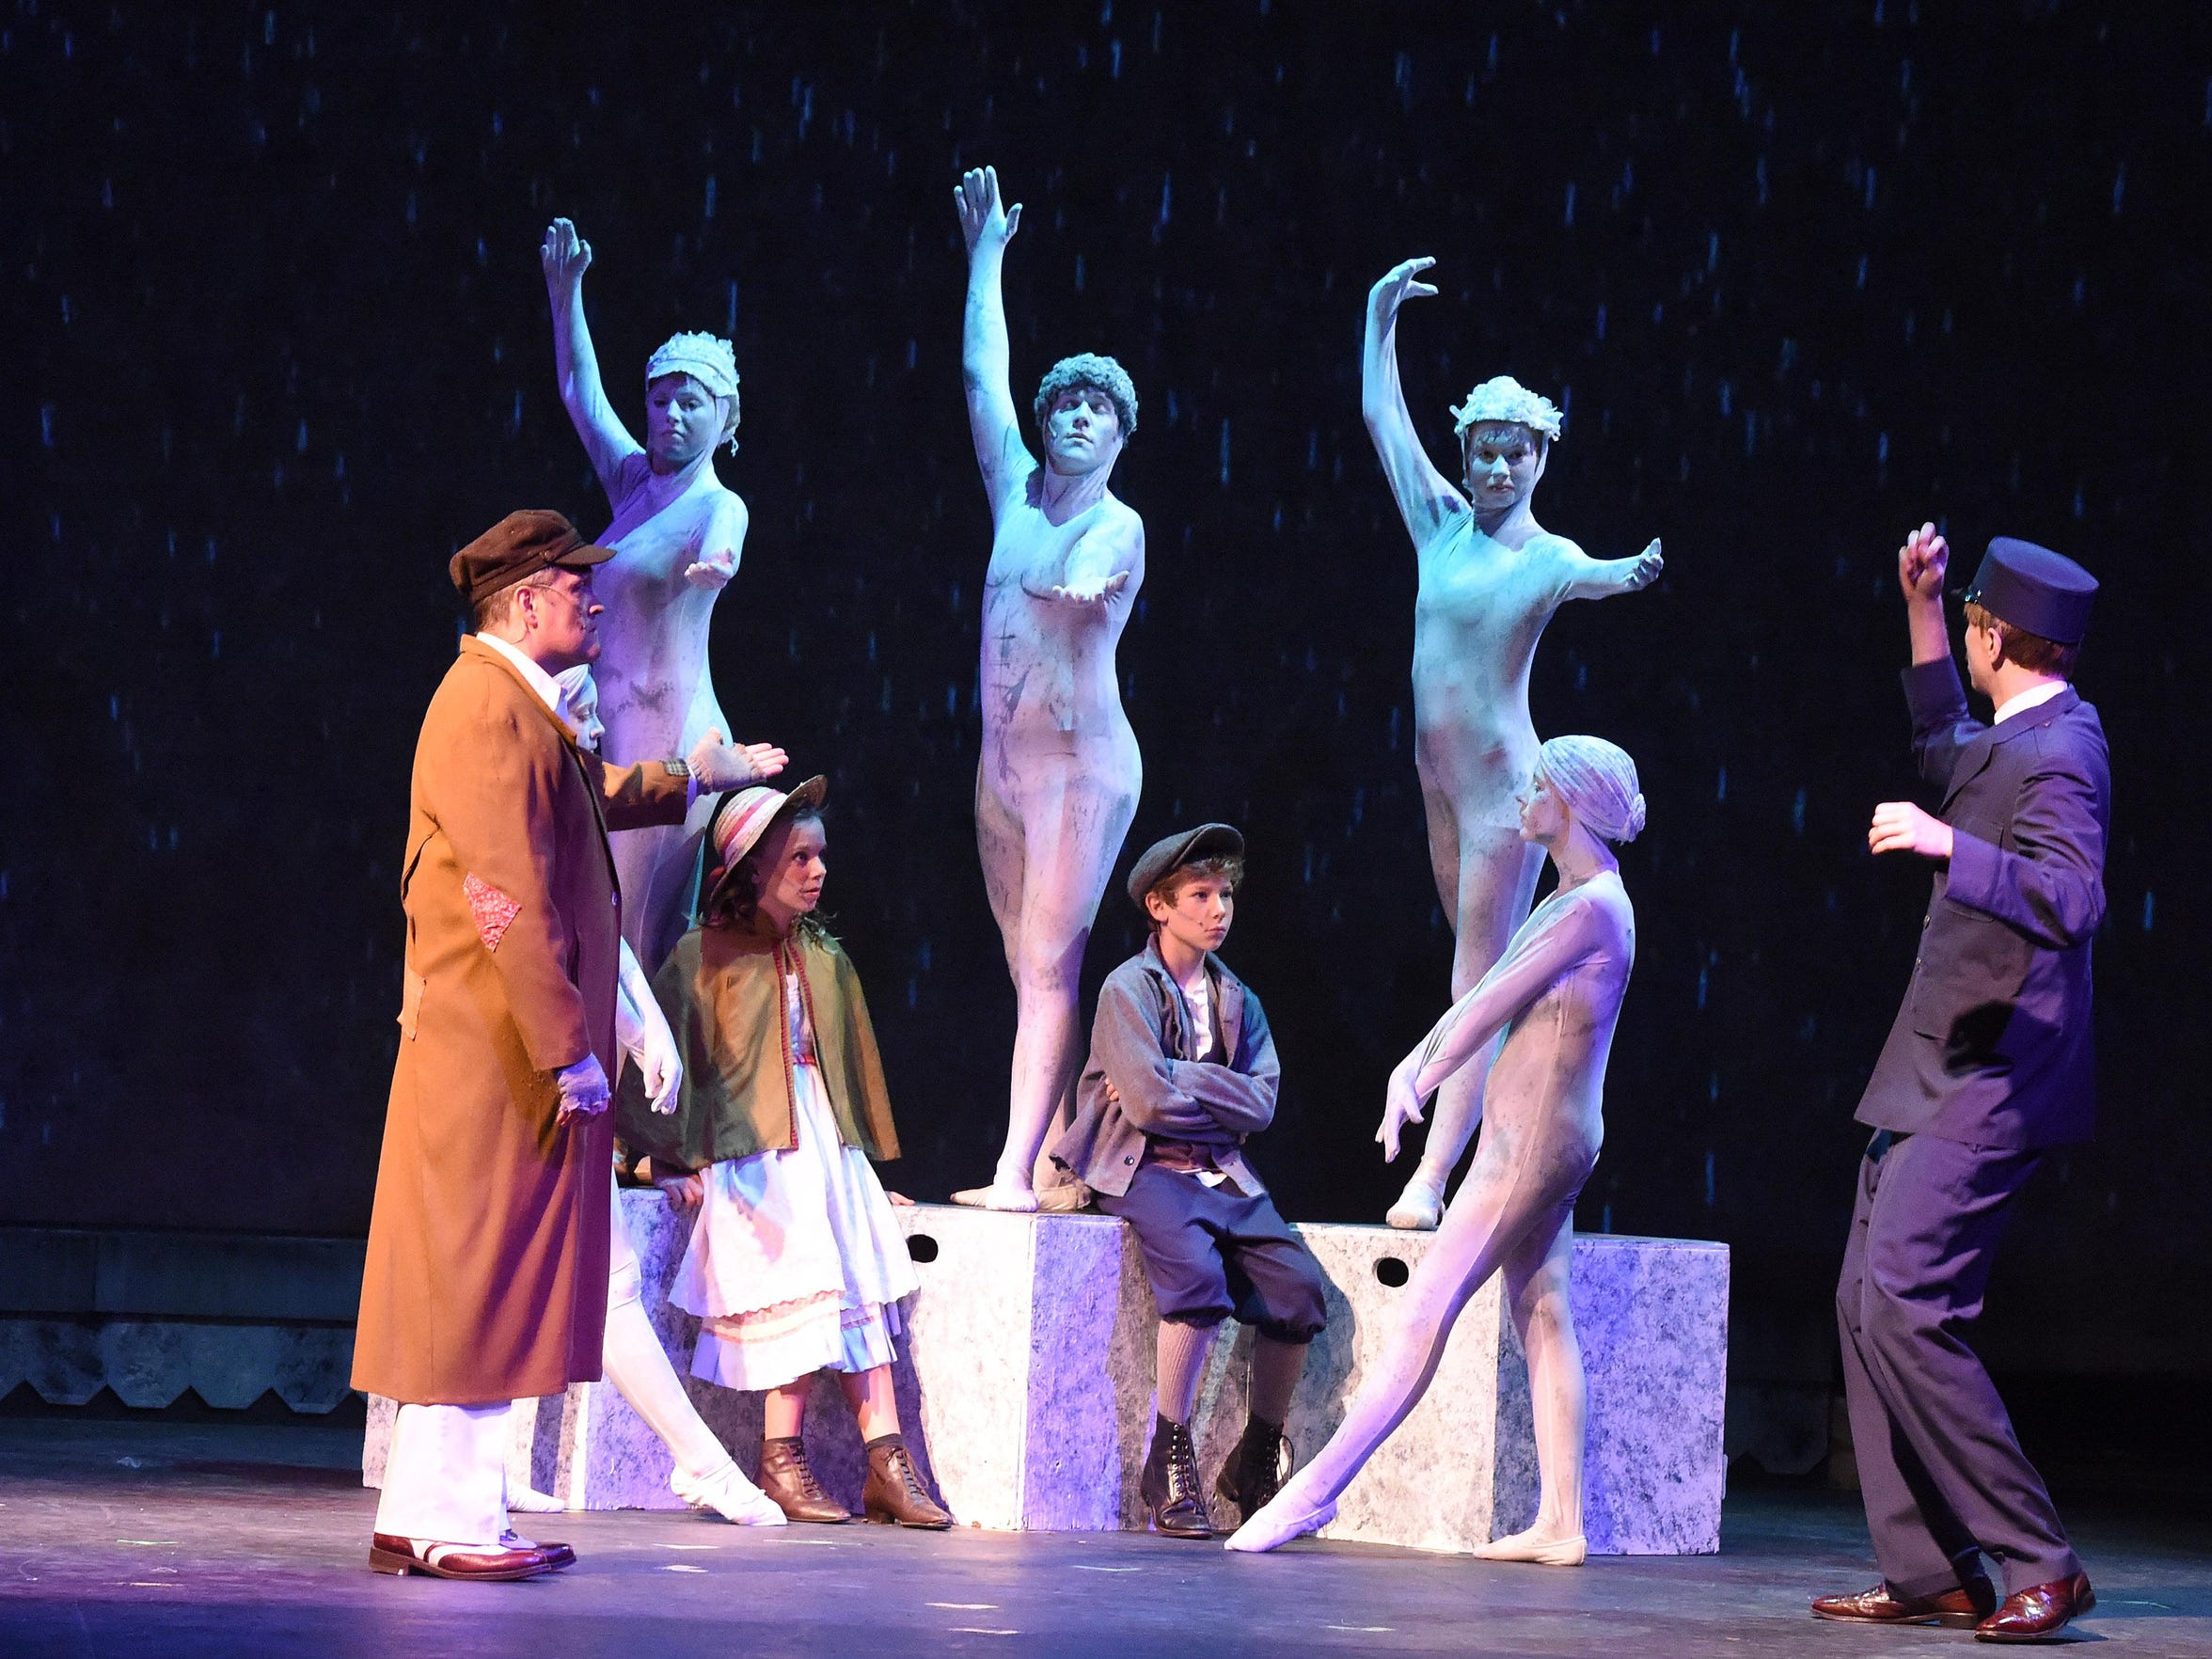 Lighting illuminates the ensemble actors portraying